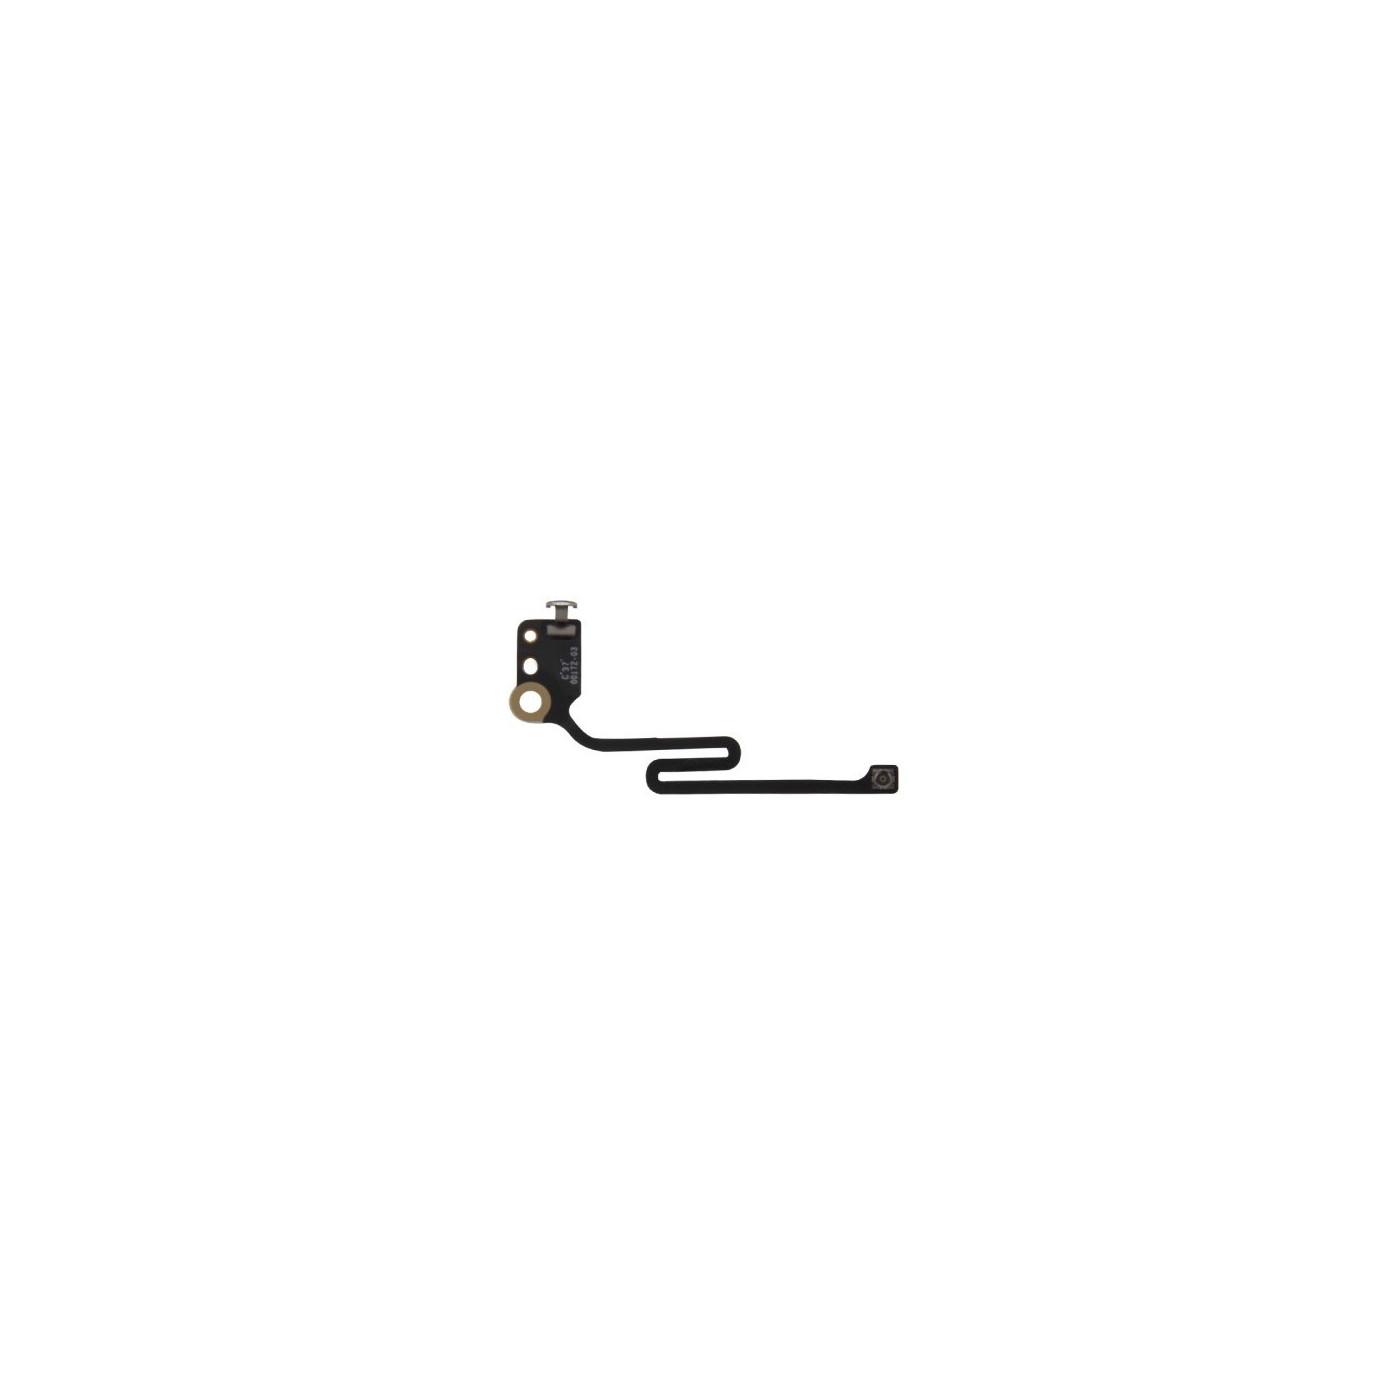 Antena plana wifi wifi para iPhone 6s Más señal inalámbrica plana WI-FI